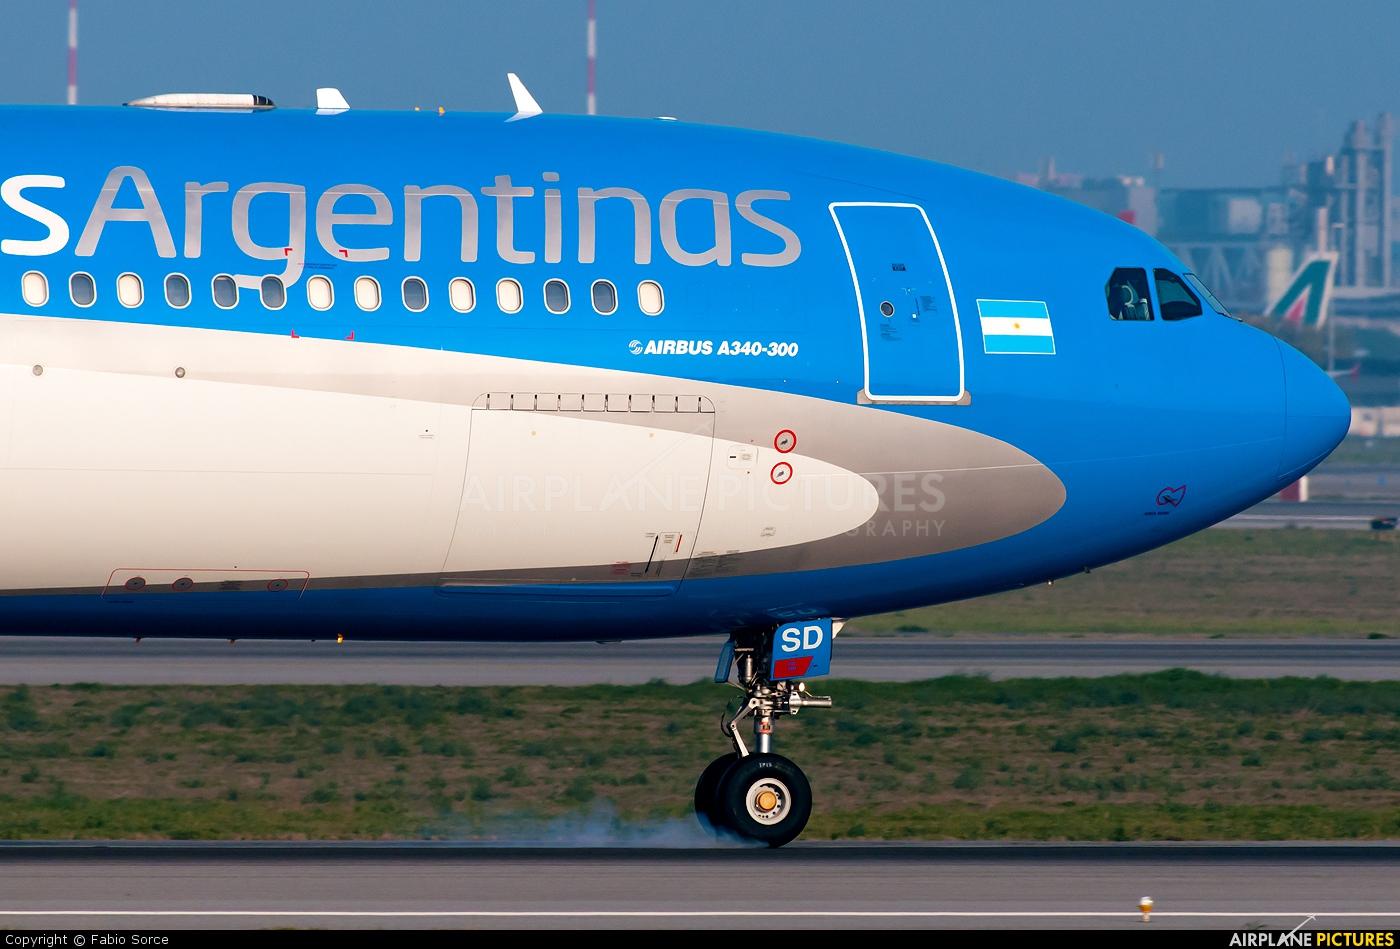 Aerolineas Argentinas LV-CSD aircraft at Rome - Fiumicino